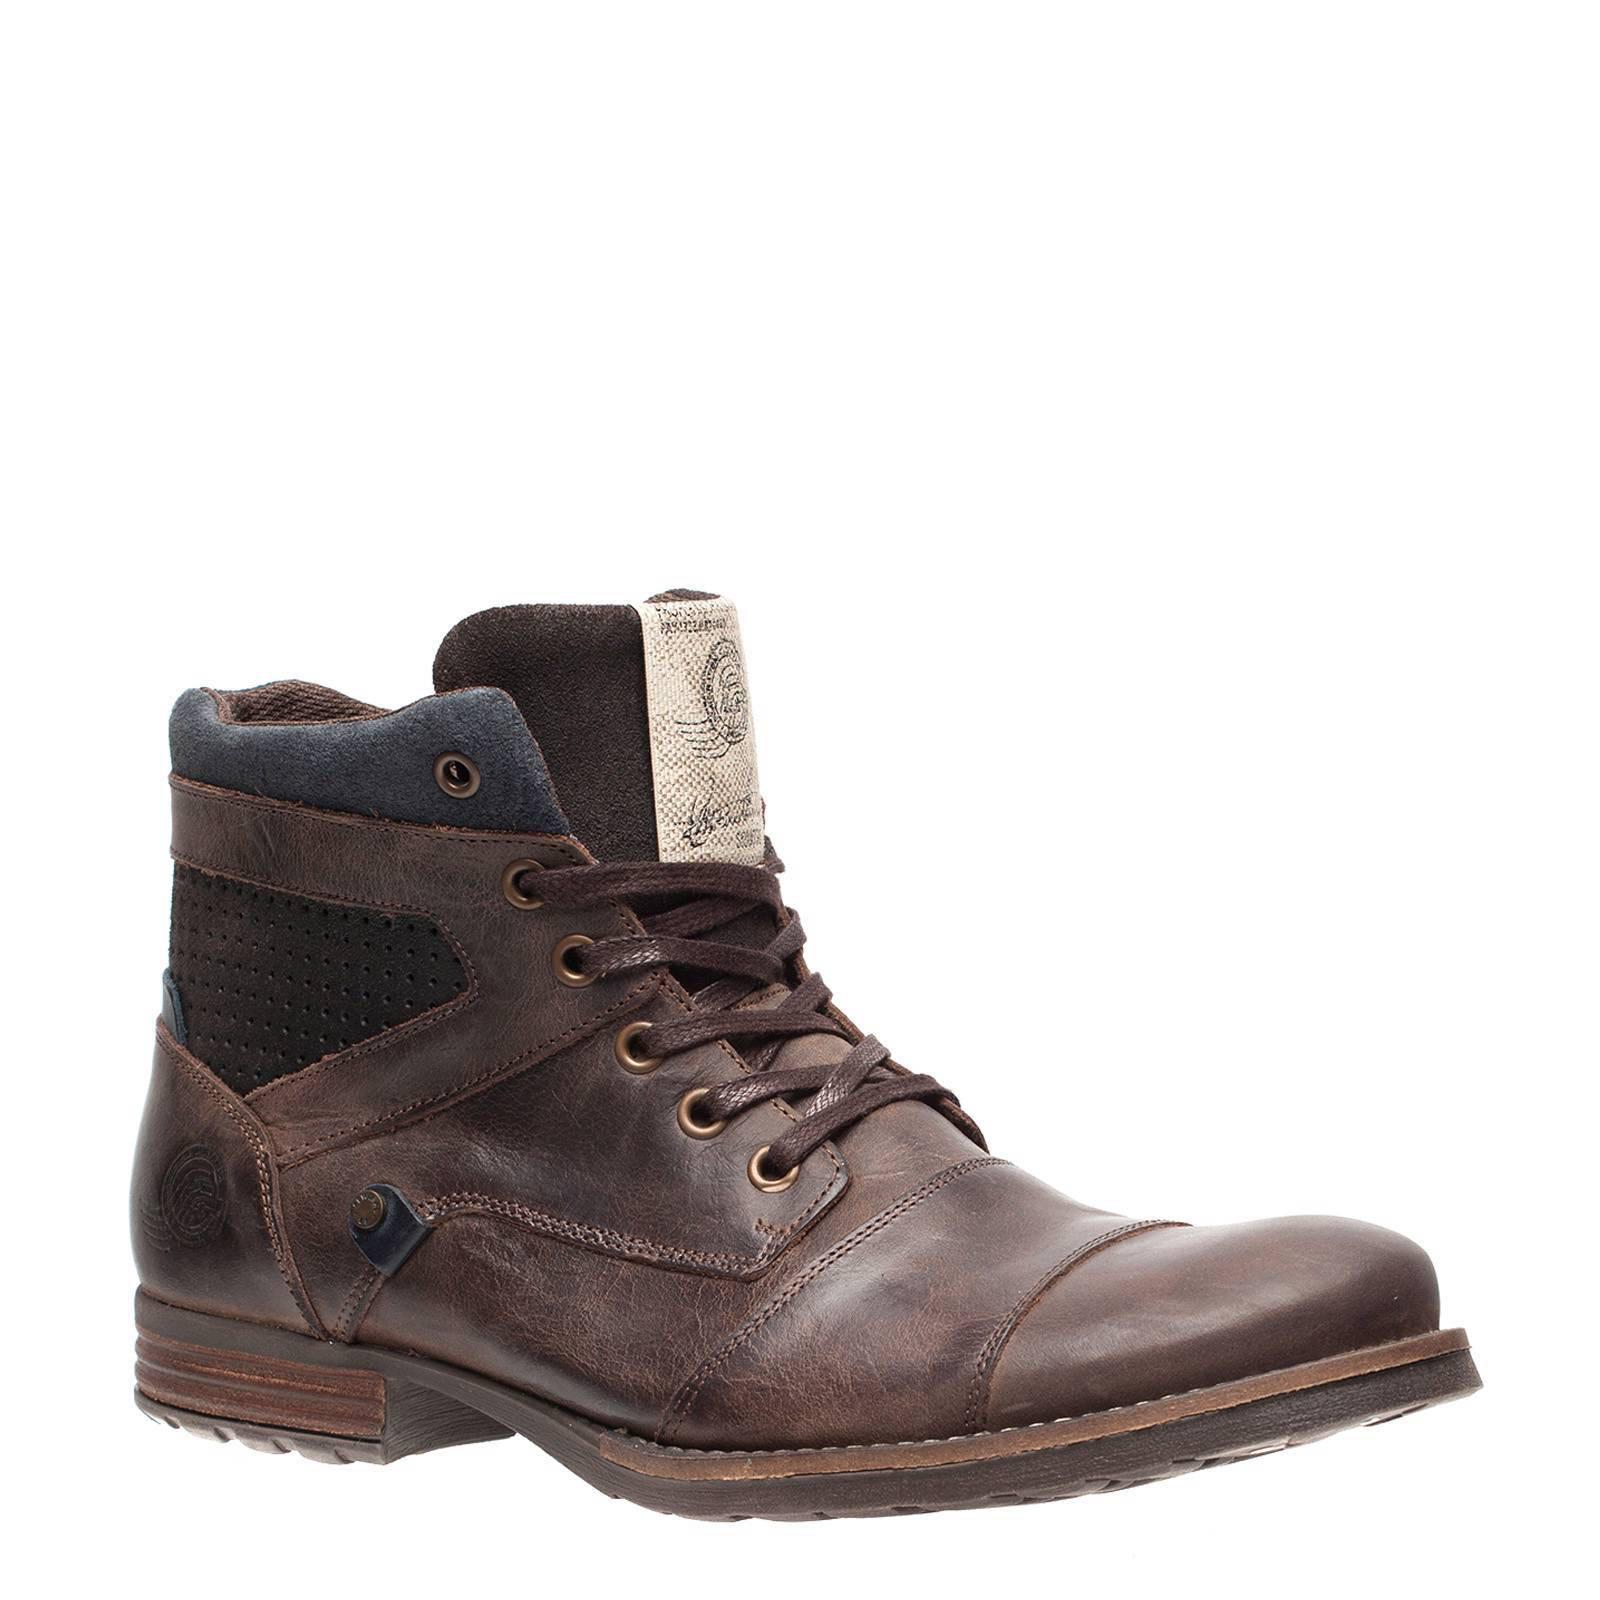 Chaussures Pour Les Hommes Brunette Scapino AQE4TaU2